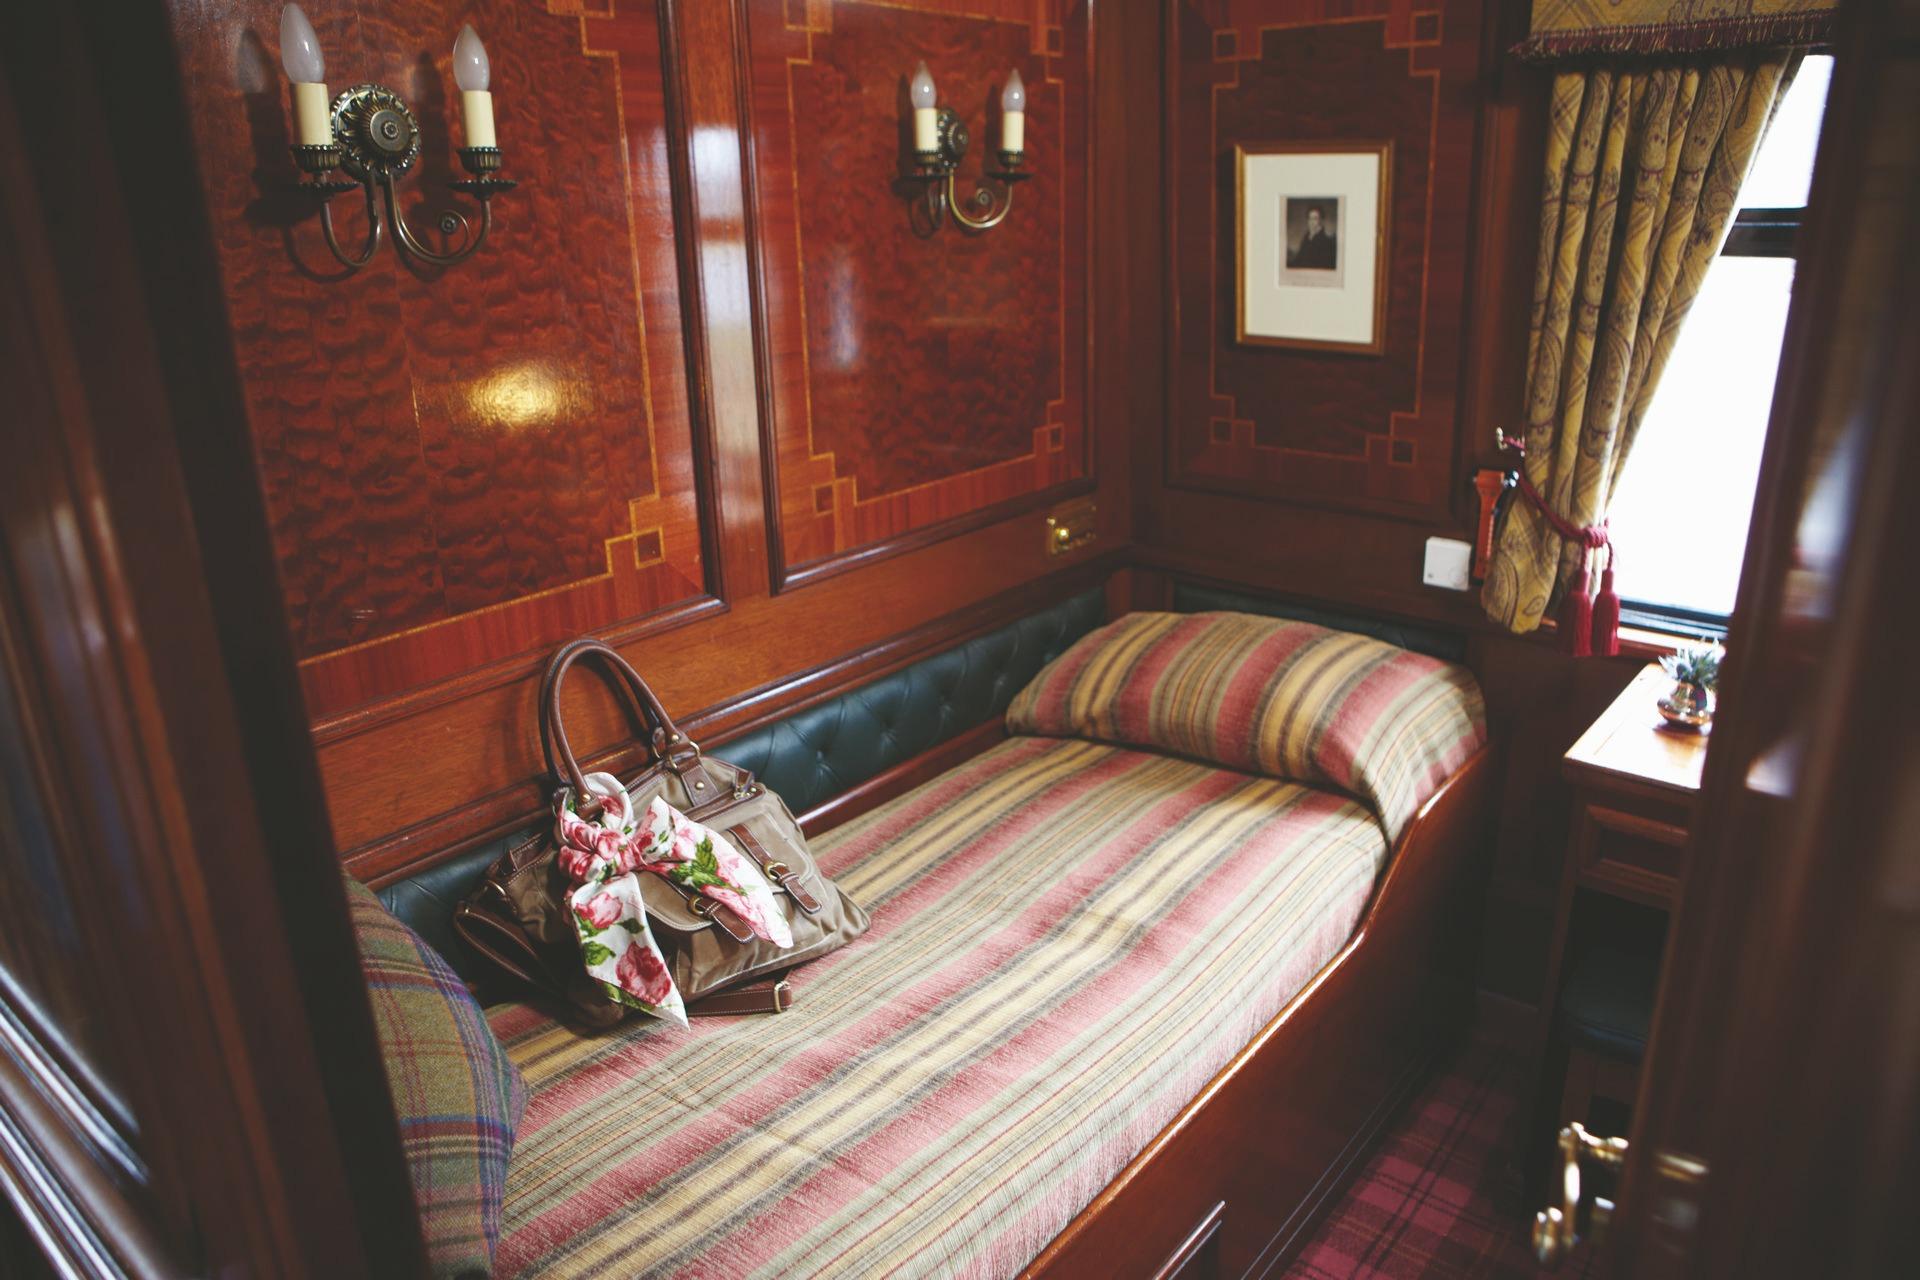 NOMAD-luksusowe-pociągi-Belmond-Royal-Scotsman-02-1